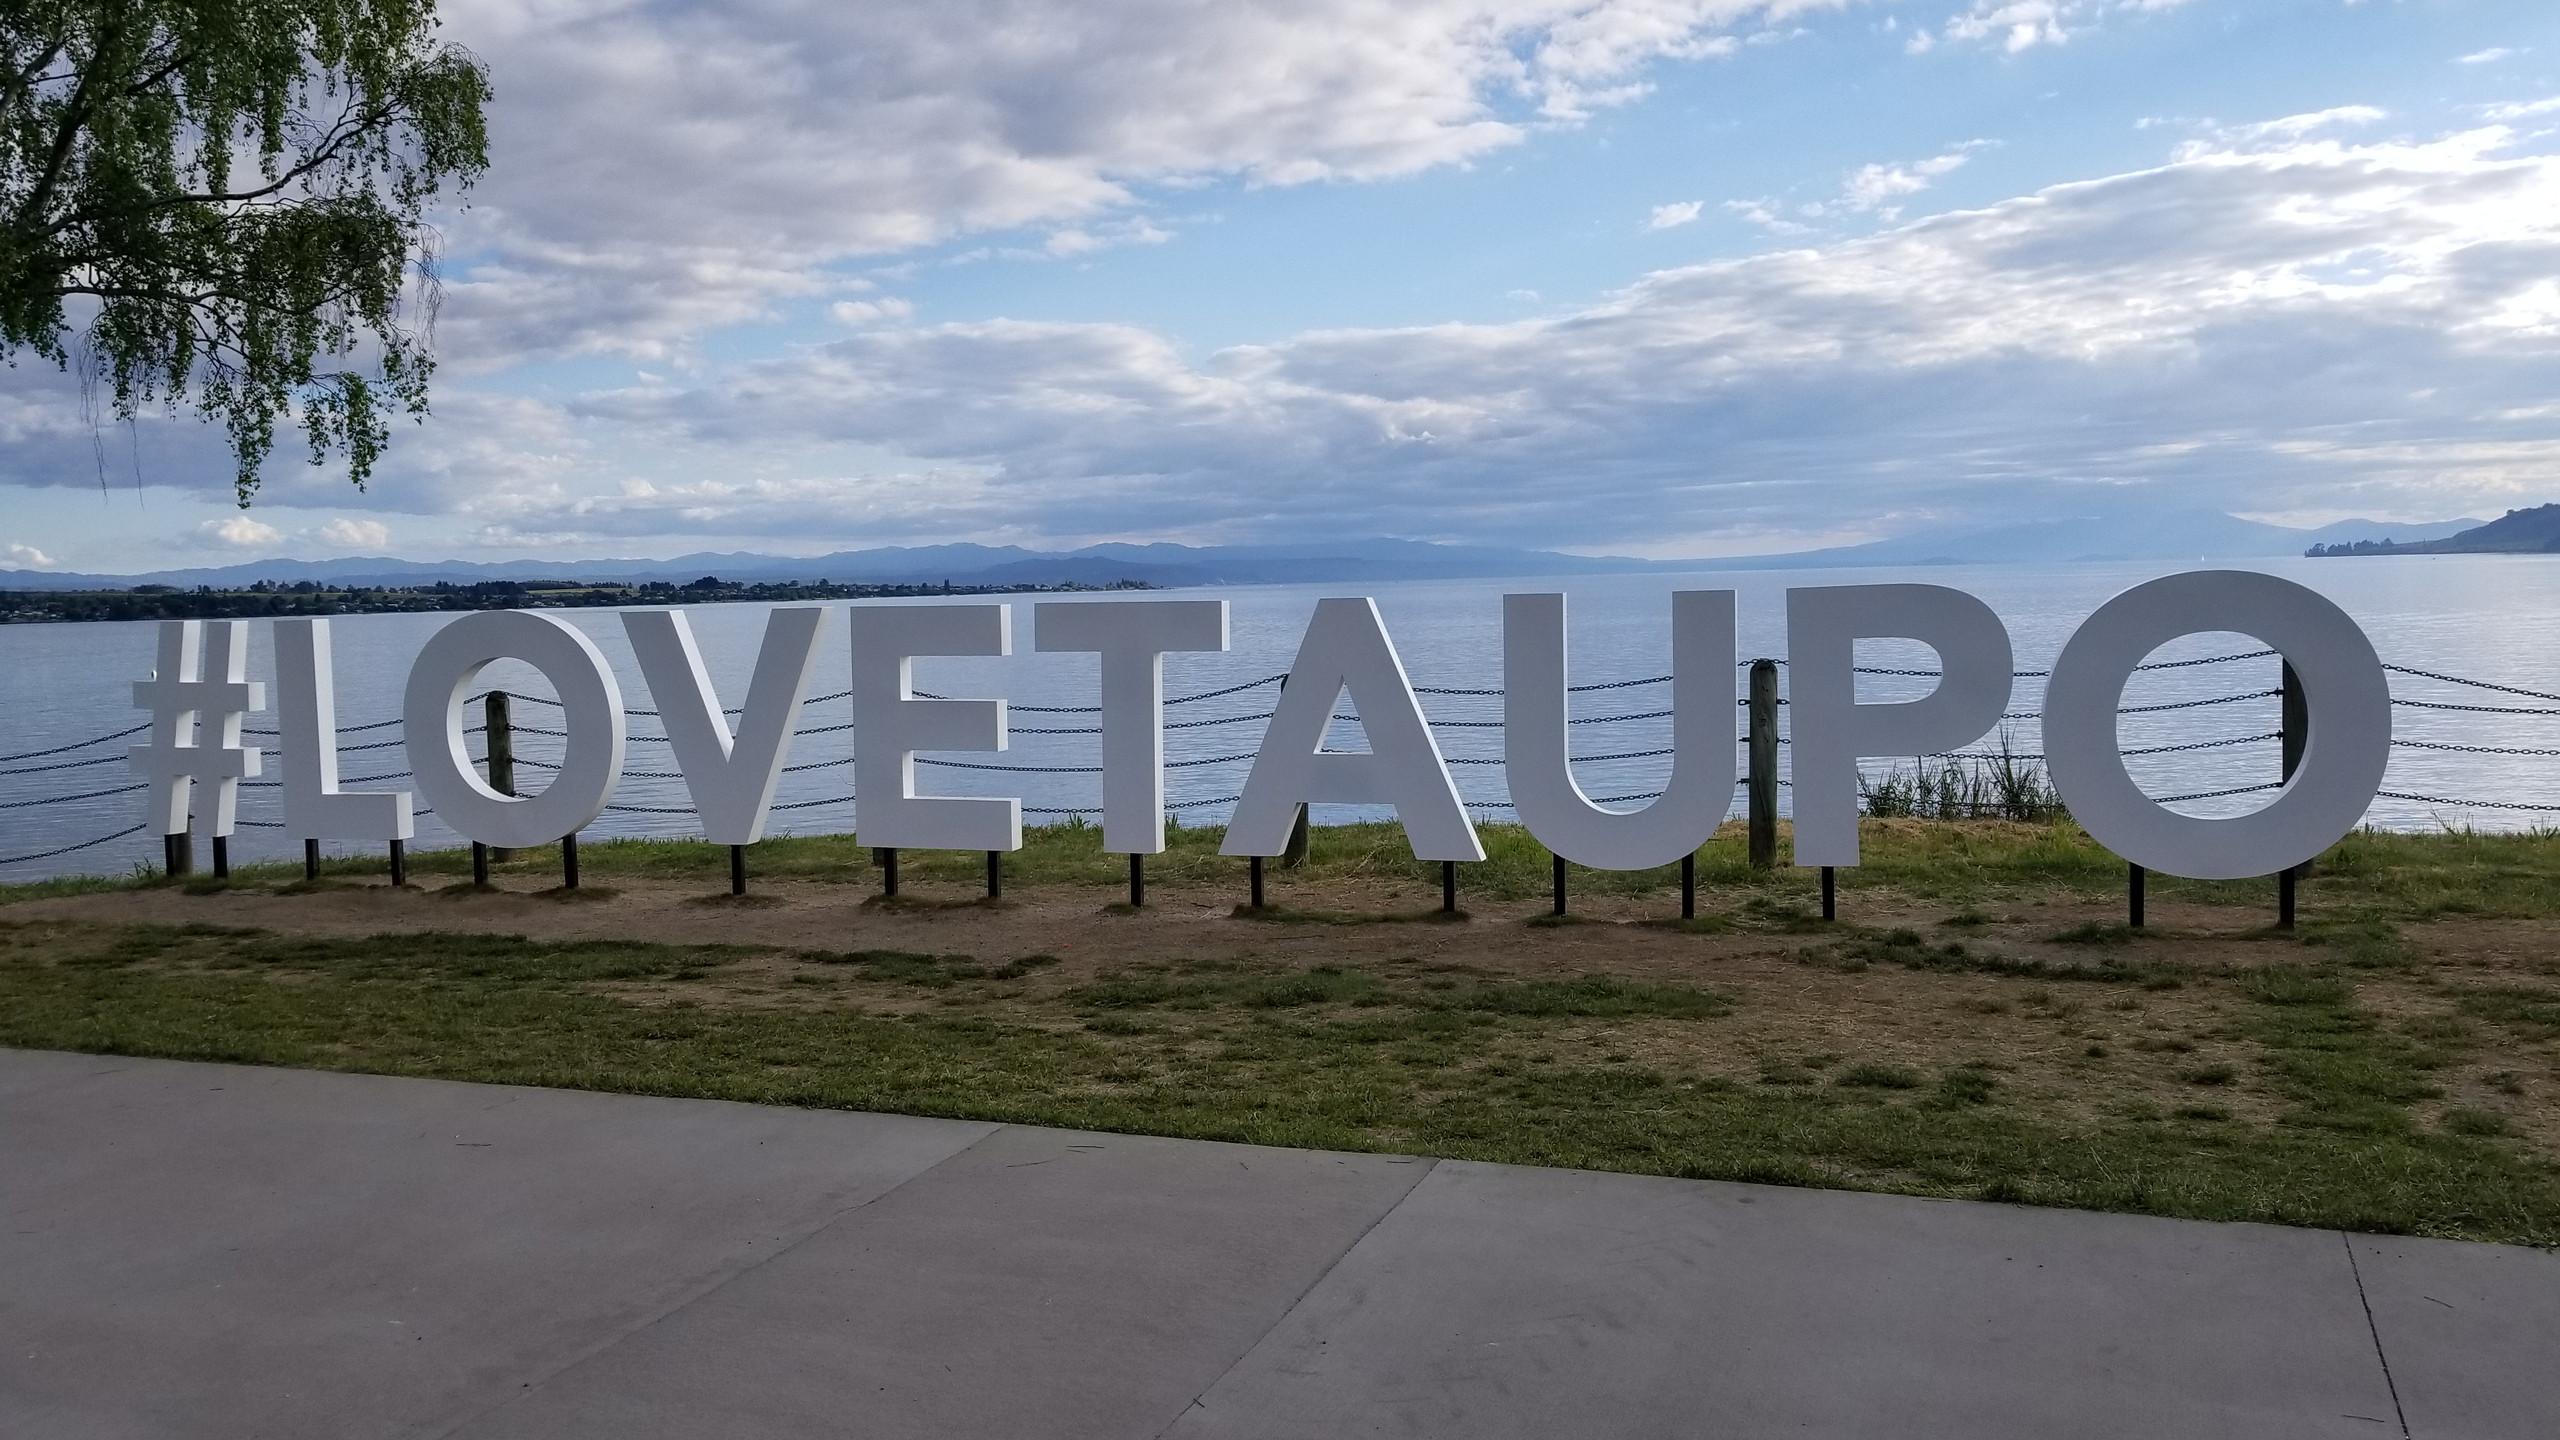 Taupo, New Zealand activities, New Zealand attractions